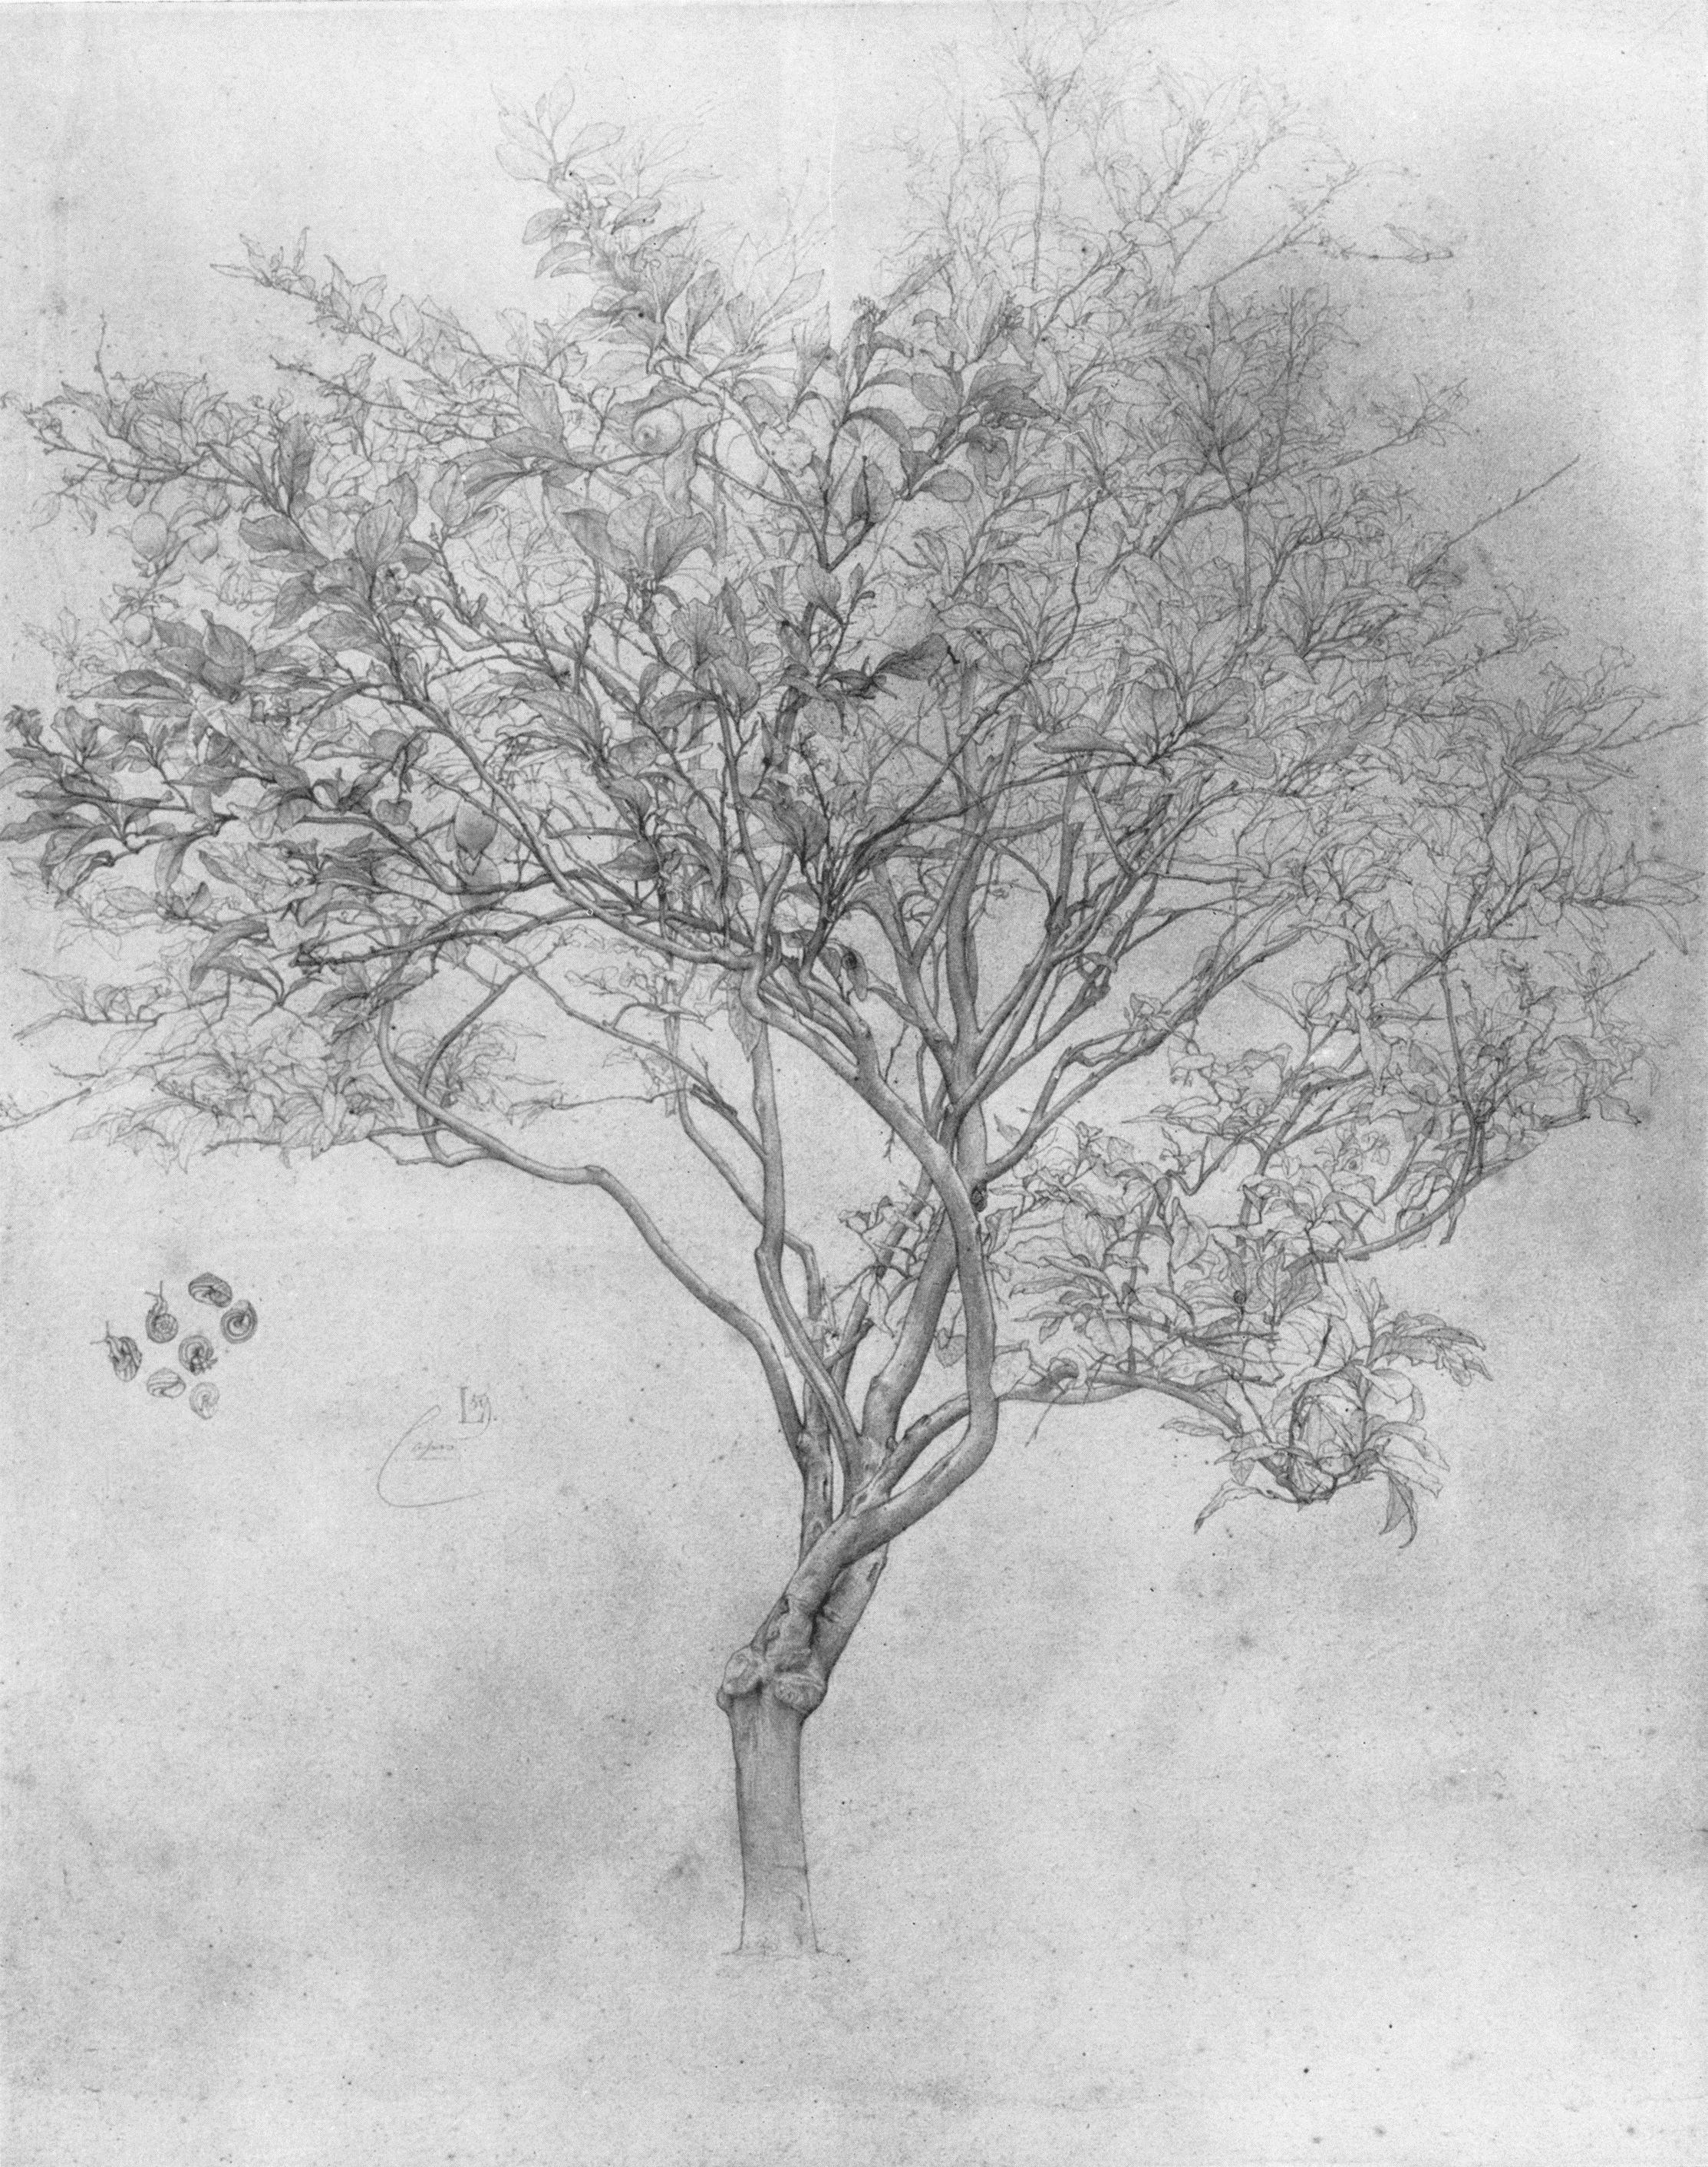 Lemon Tree Artwork Study of a Lemon Tree